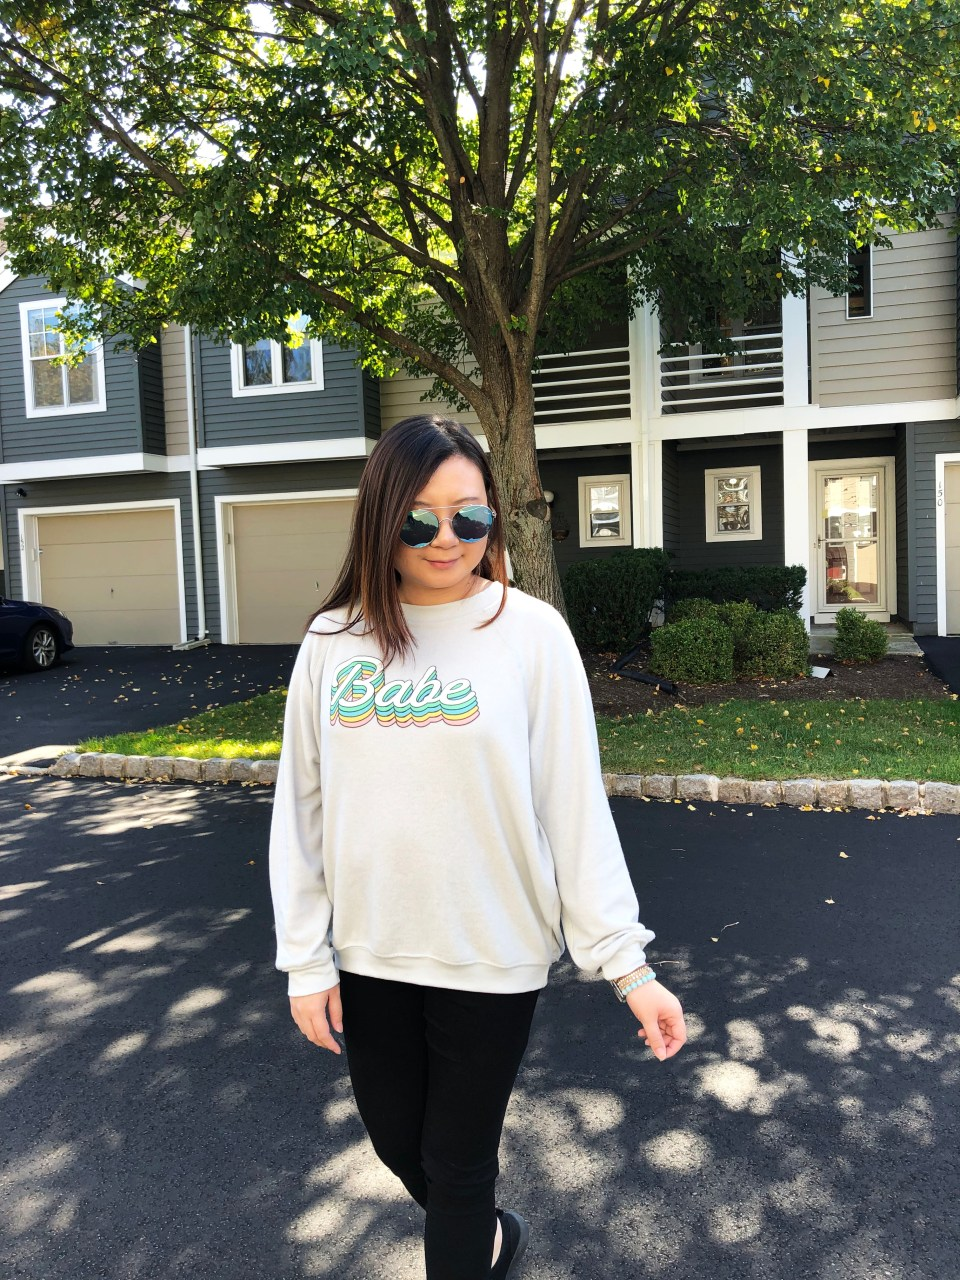 Babe Sweatshirt 16